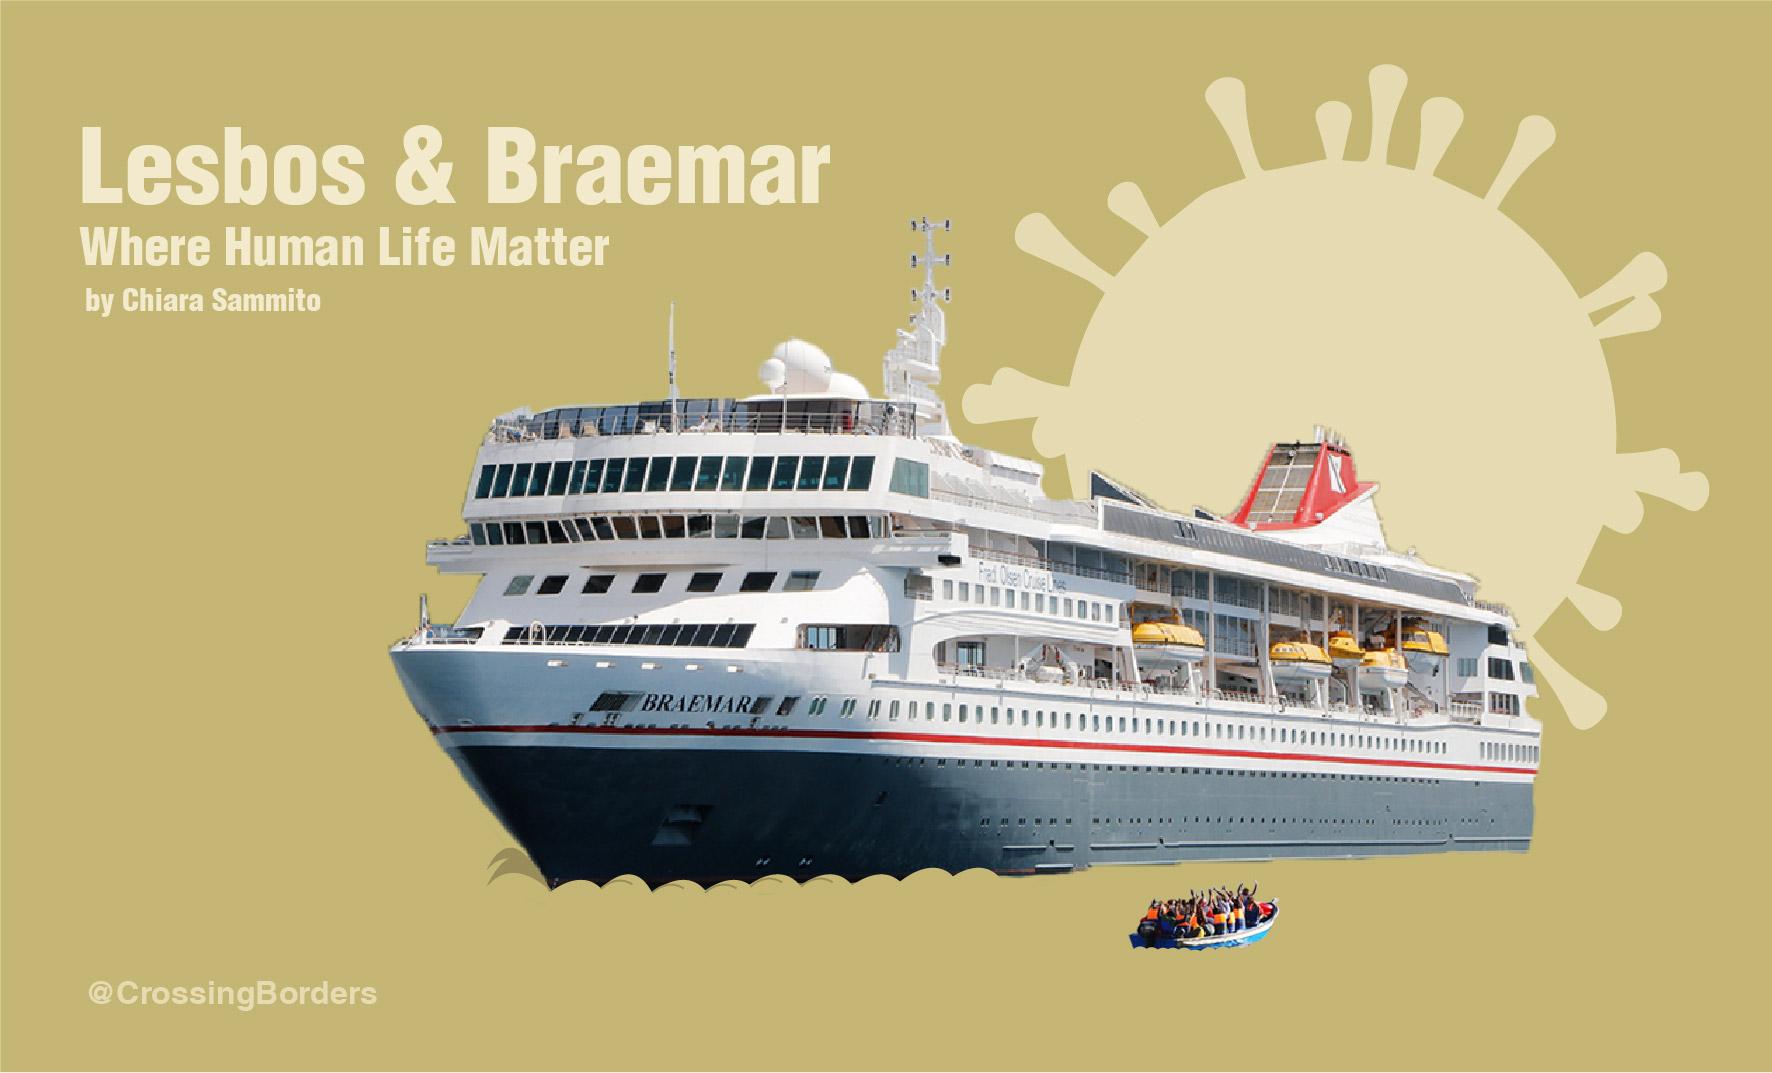 Lesbos & Braemar – Where Human Life Matter